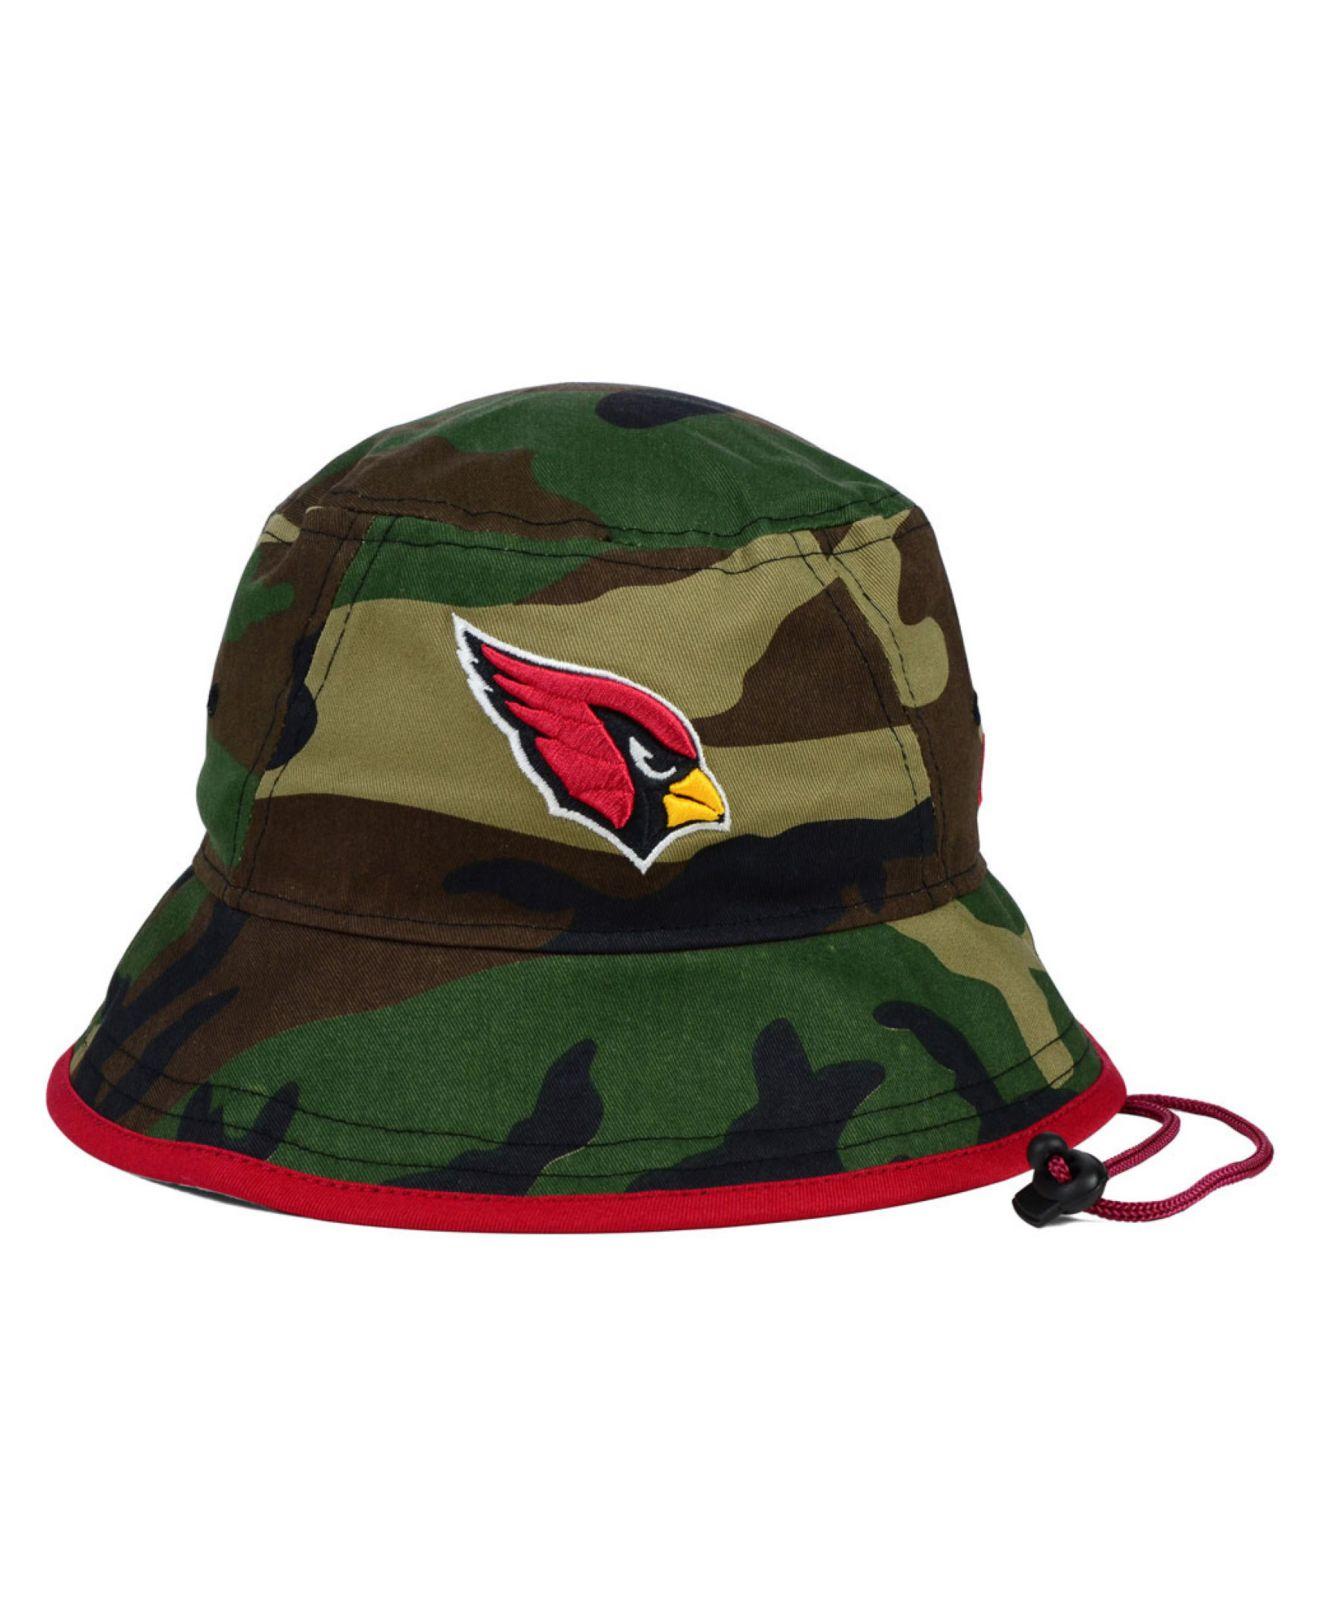 brand new a2ea8 102b9 ... wholesale lyst ktz arizona cardinals camo pop bucket hat in green for  men 6ccaa e63f6